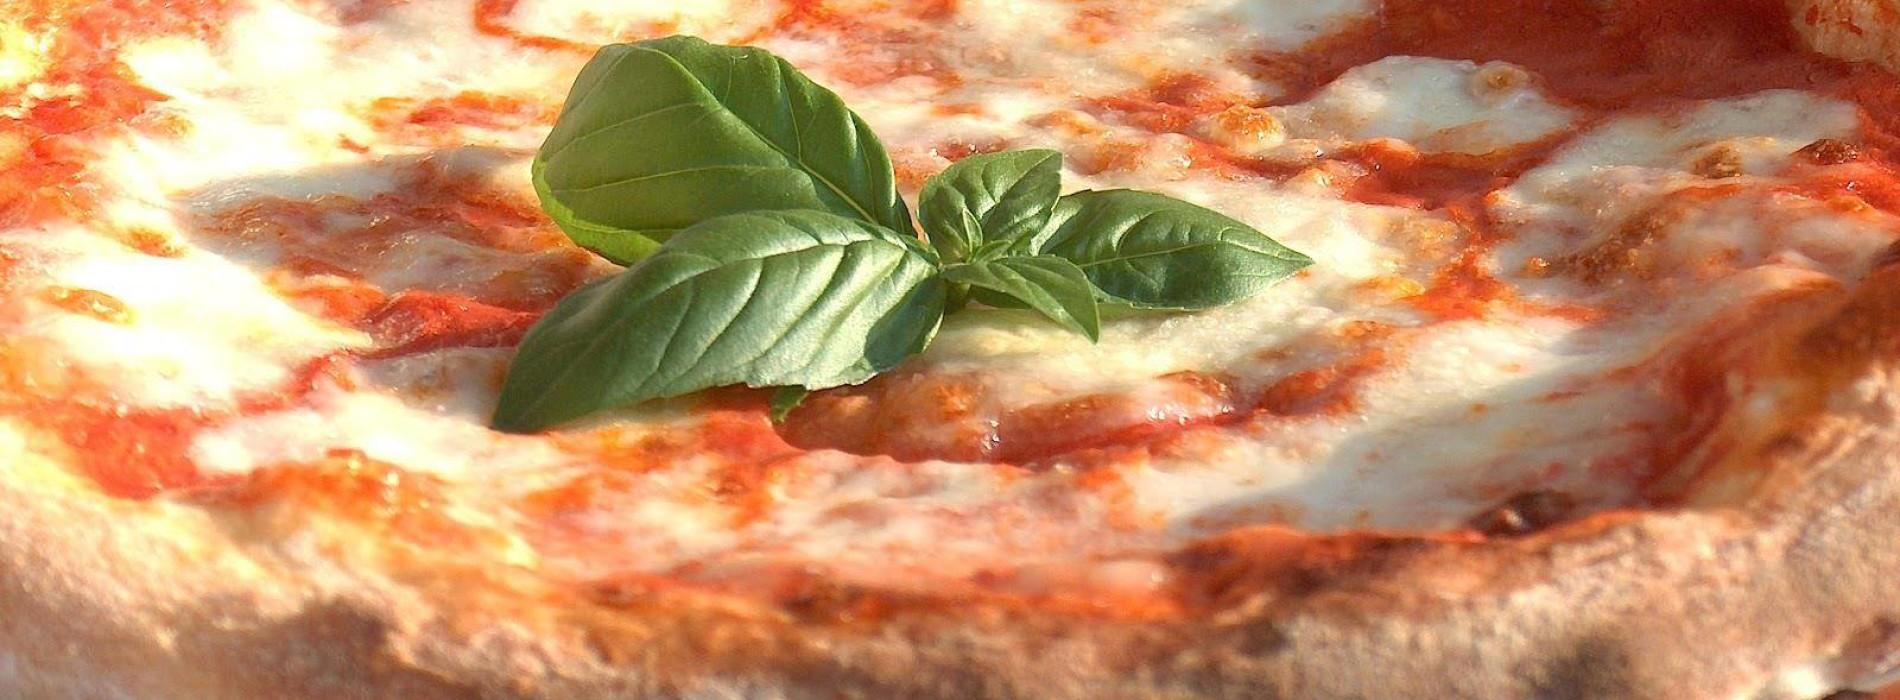 Le migliori pizzerie di Milano, da Dry a Taverna Gourmet